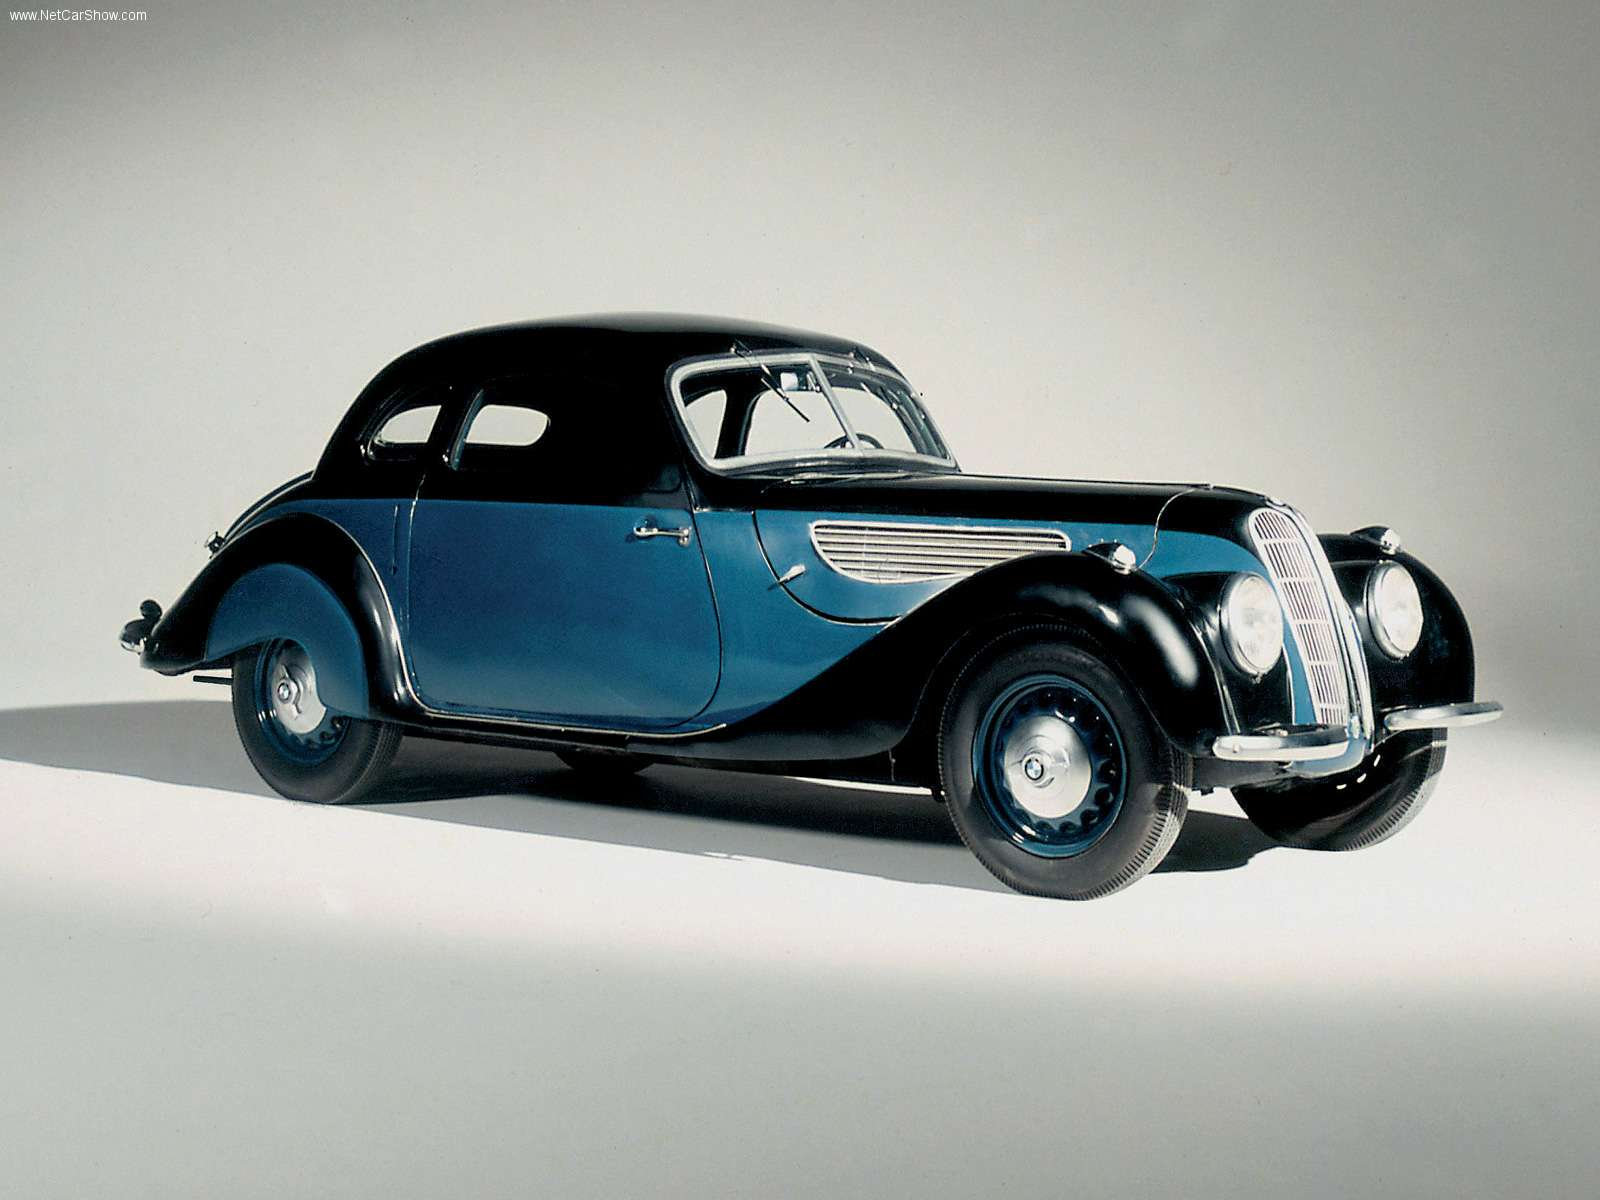 BMW 321 I 1937 - 1950 Sedan 2 door #4